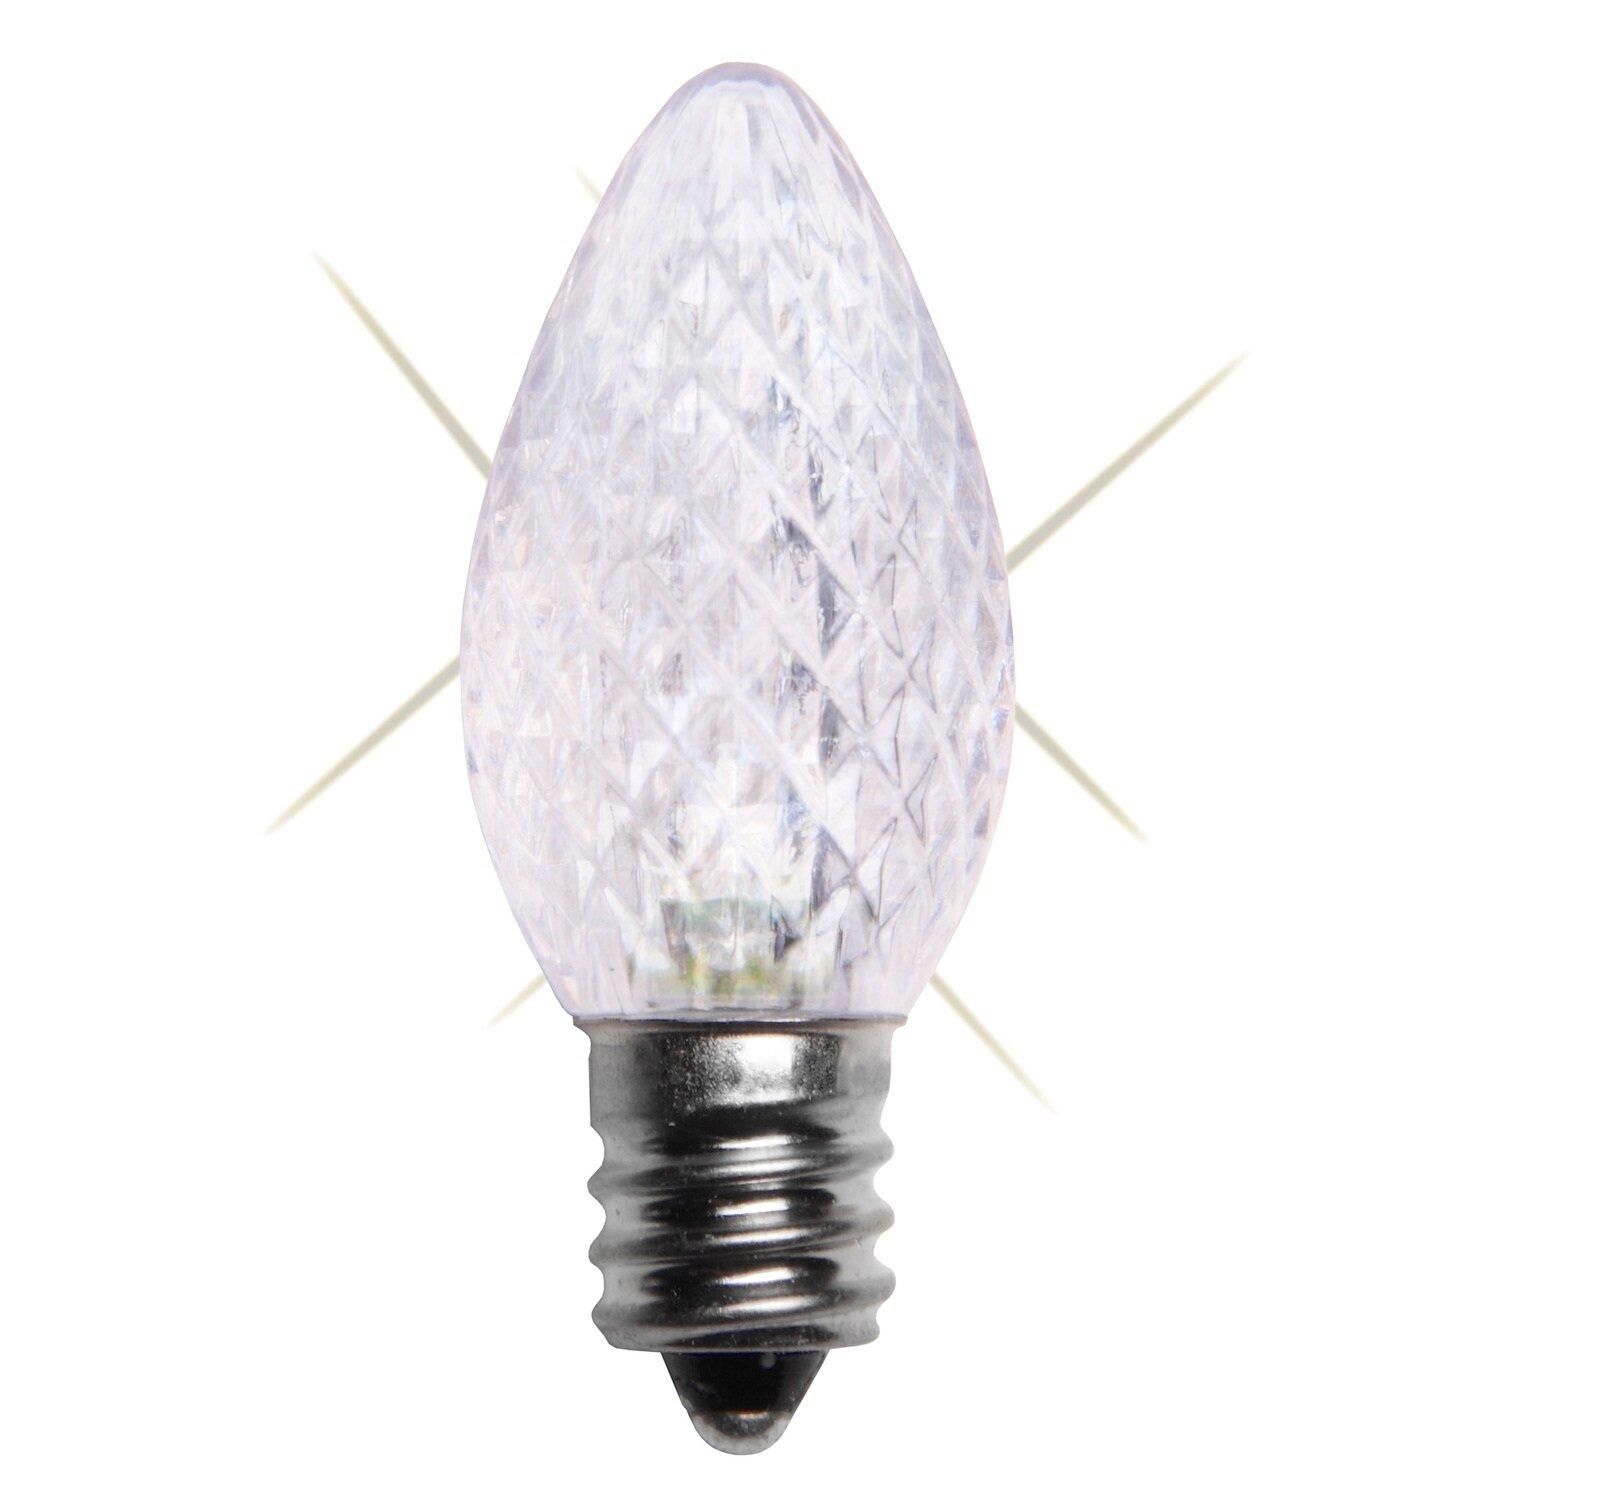 Wintergreen Lighting 25 Watt Equivalent 130 Volt Led Light Bulb Wayfair